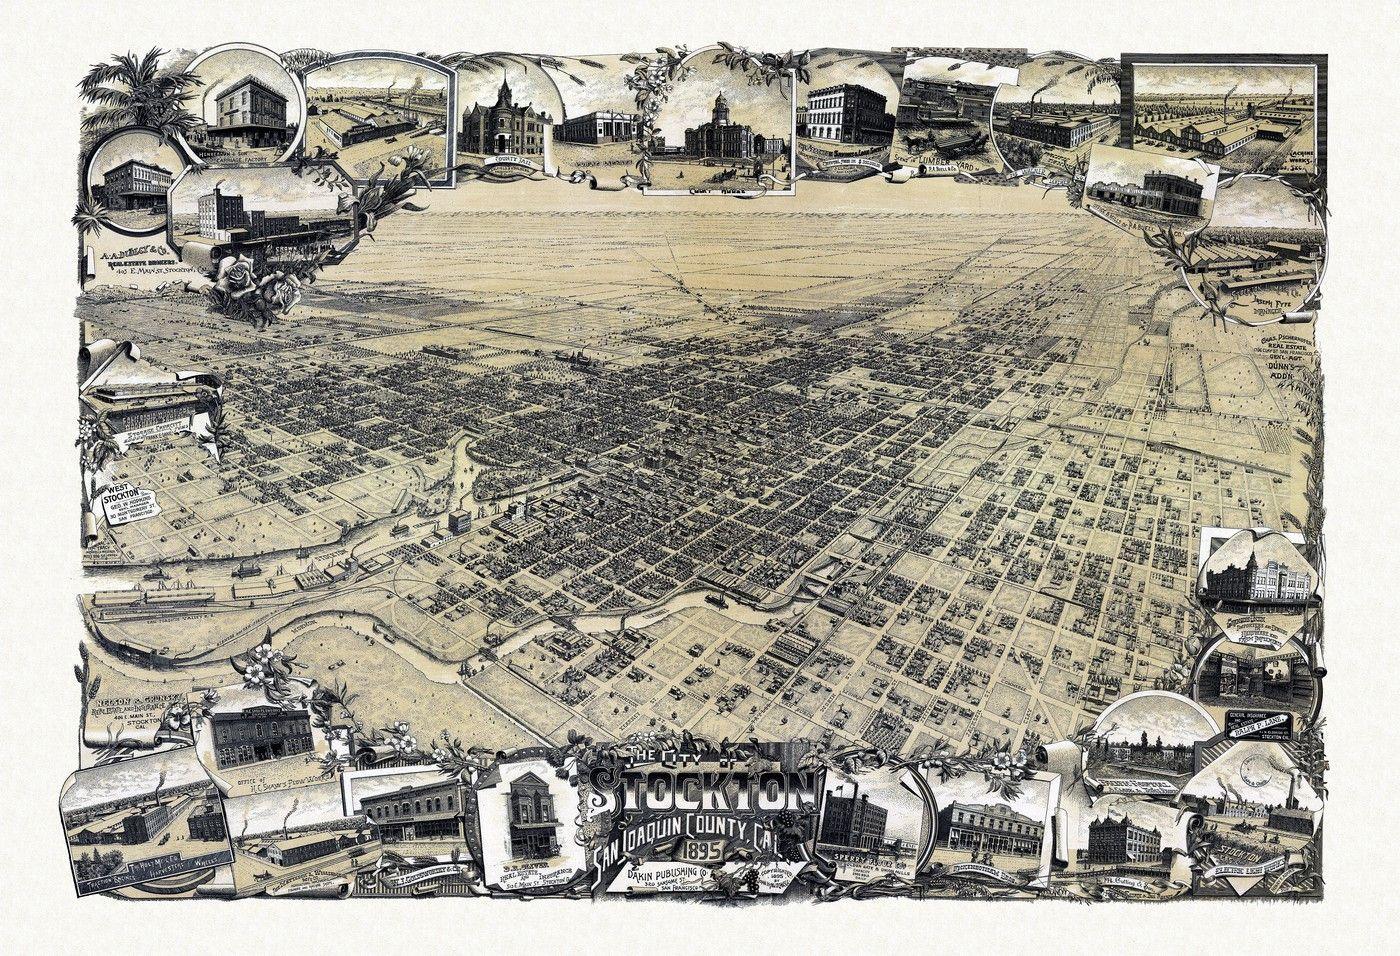 Old Map of Stockton California 1895 San Joaquin County Poster